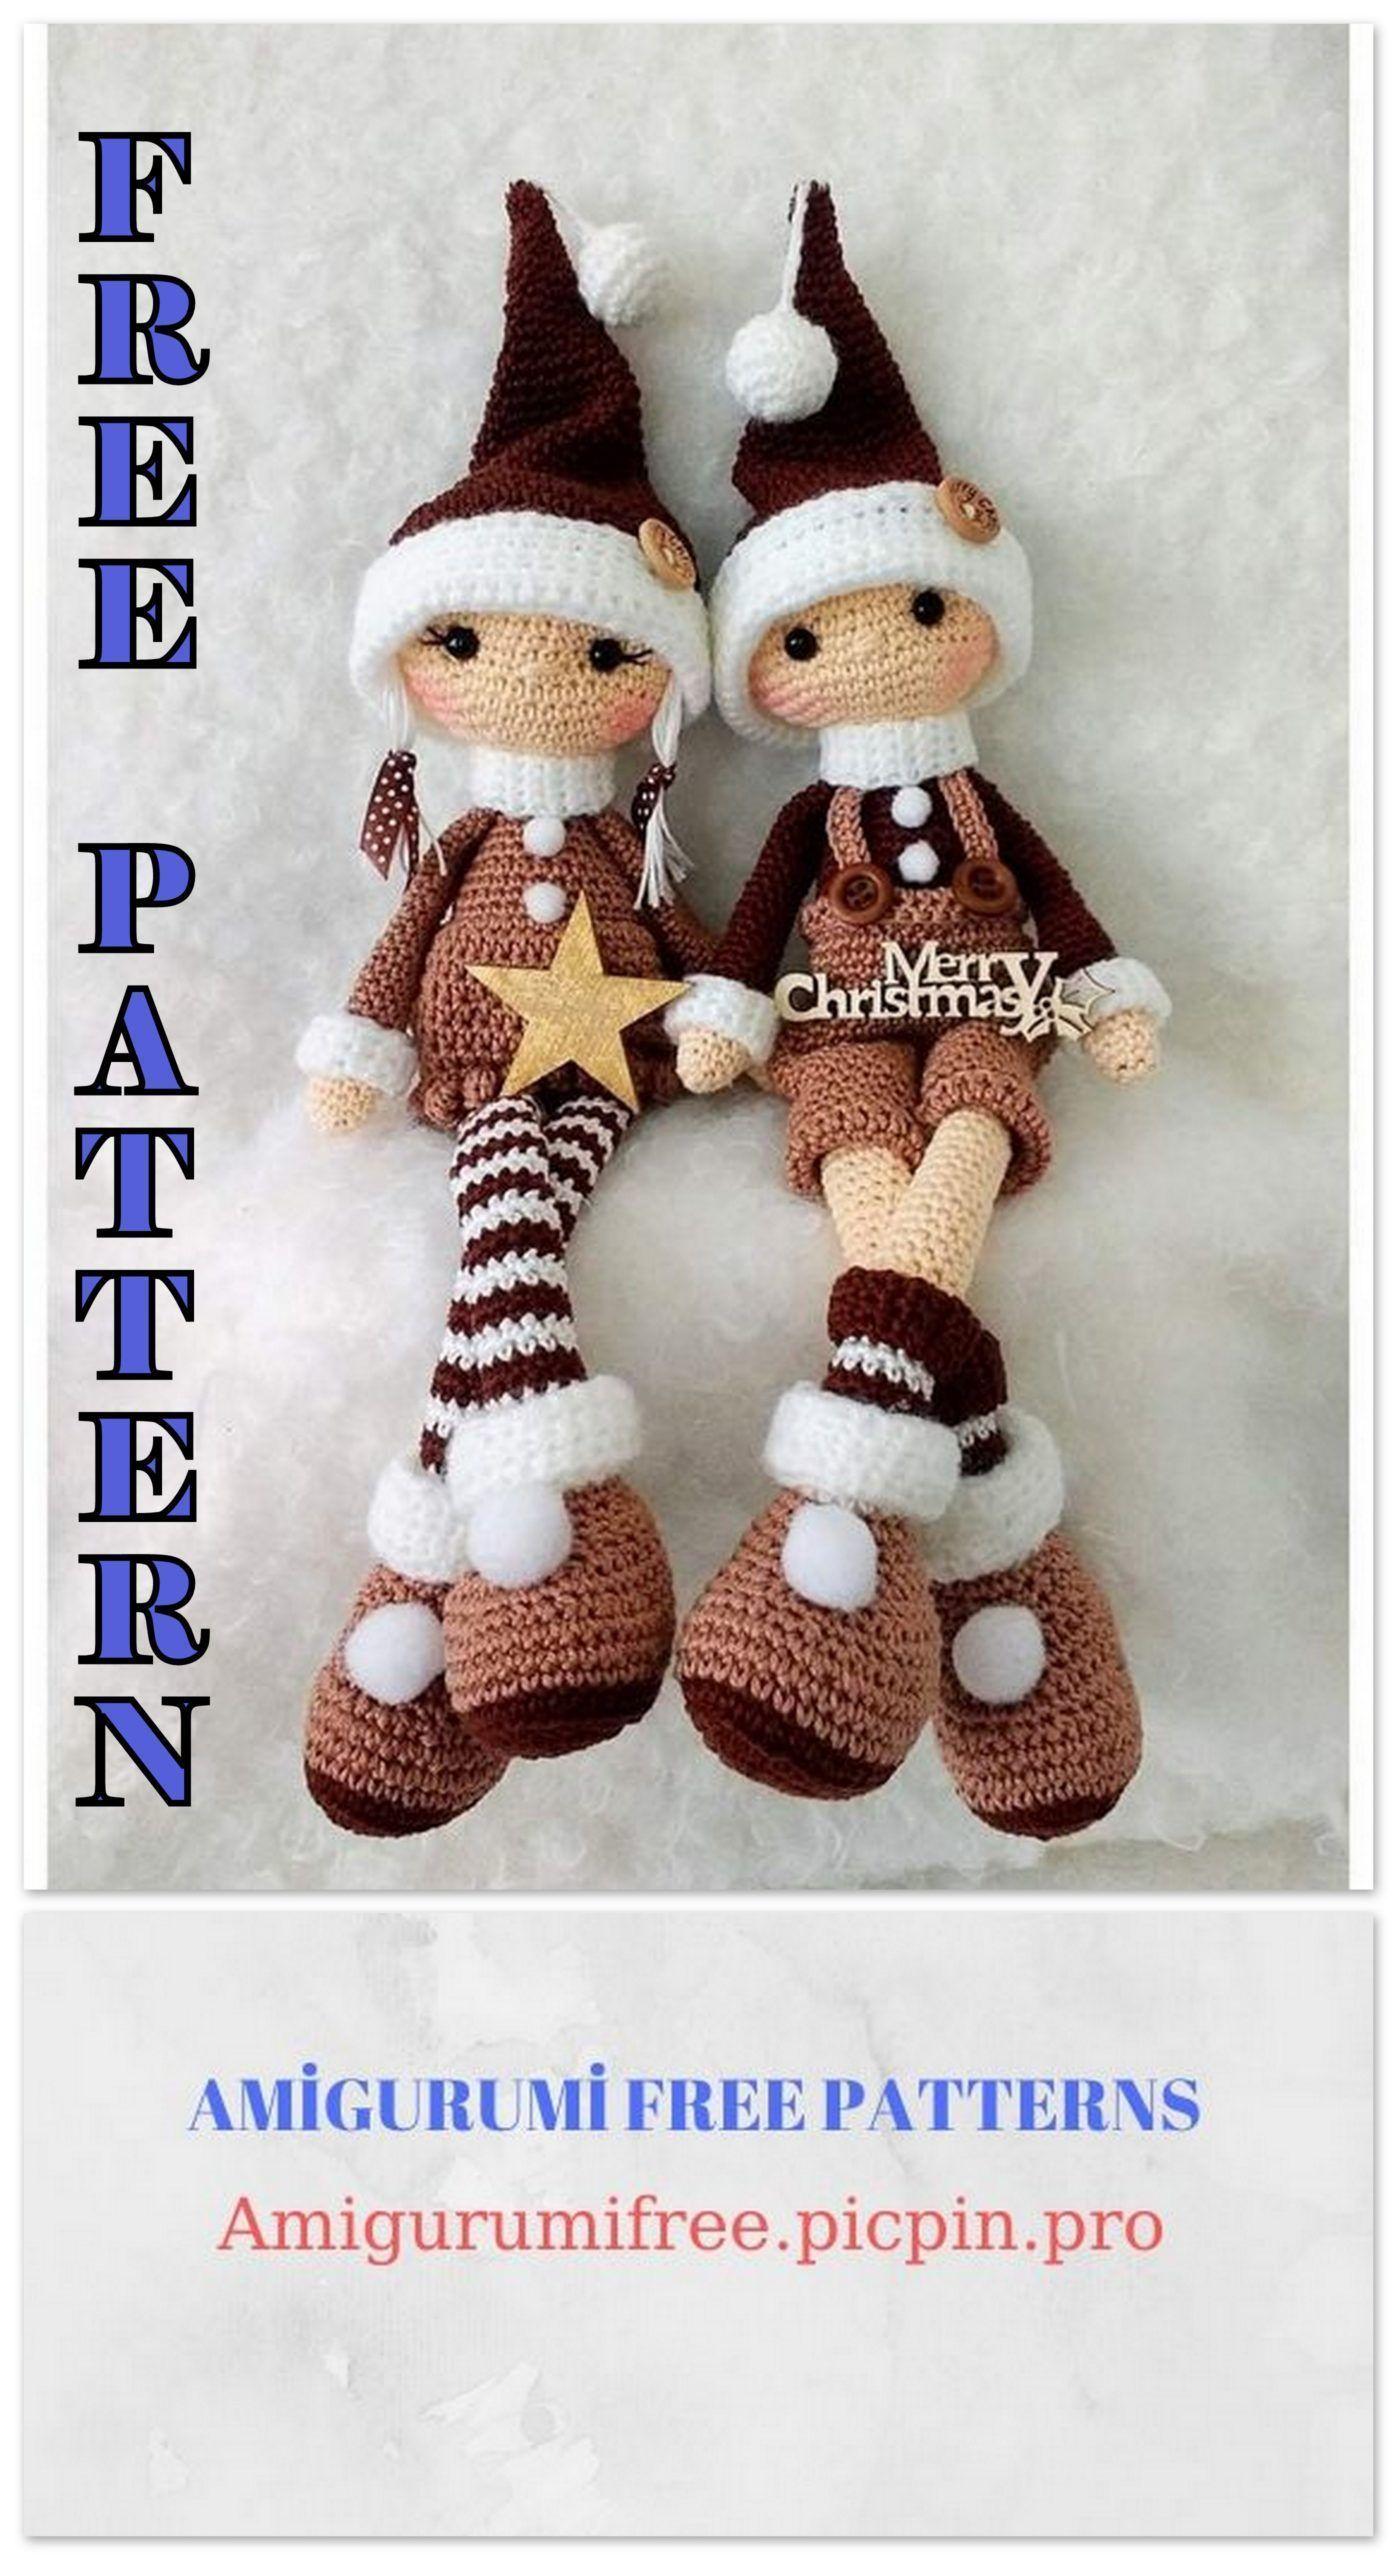 35+ Creative Image of Monkey Crochet Pattern Monkey Crochet ... | 2560x1397